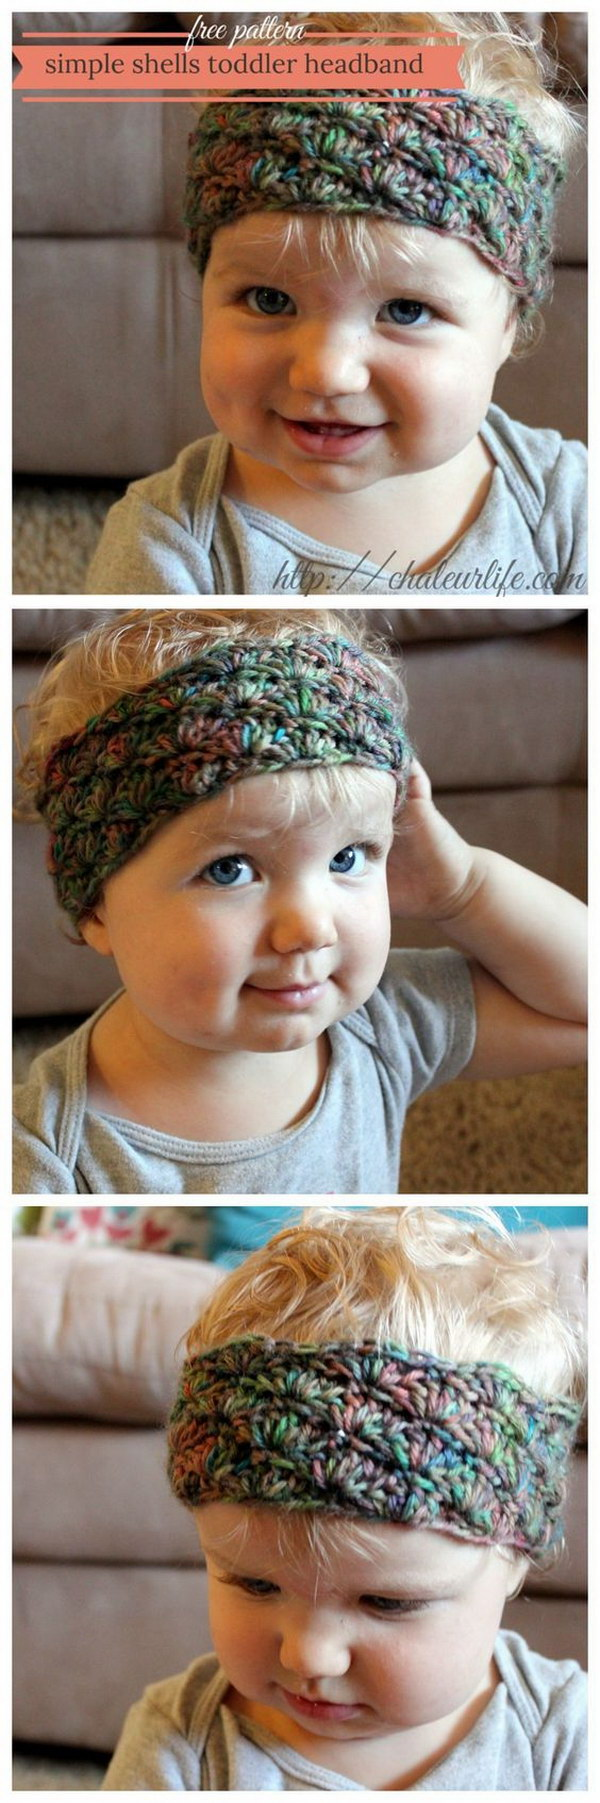 Crochet Pattern For Toddler Headband : 20+ Adorable Crochet Patterns for Babies